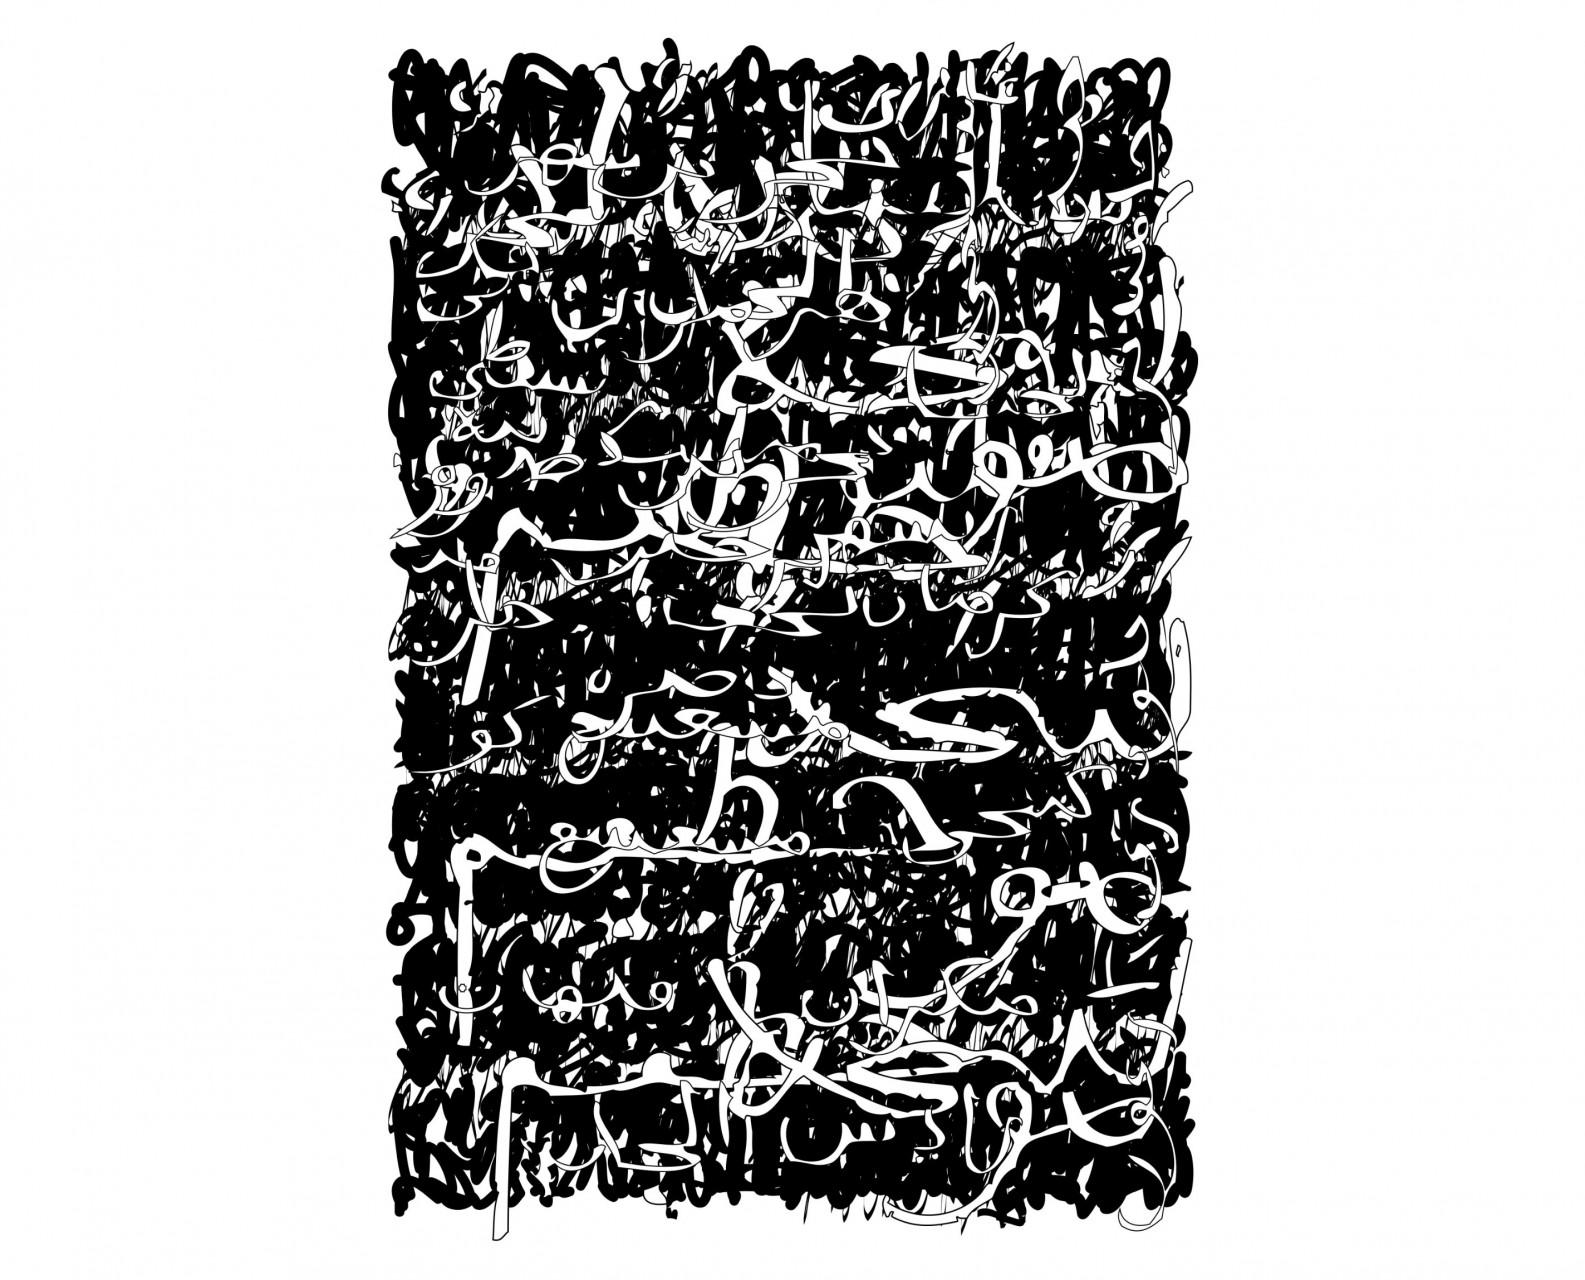 Palimpsest 015, Eco-Solvent Tinte auf LKW-Plane, 137 x 205 cm, 2017